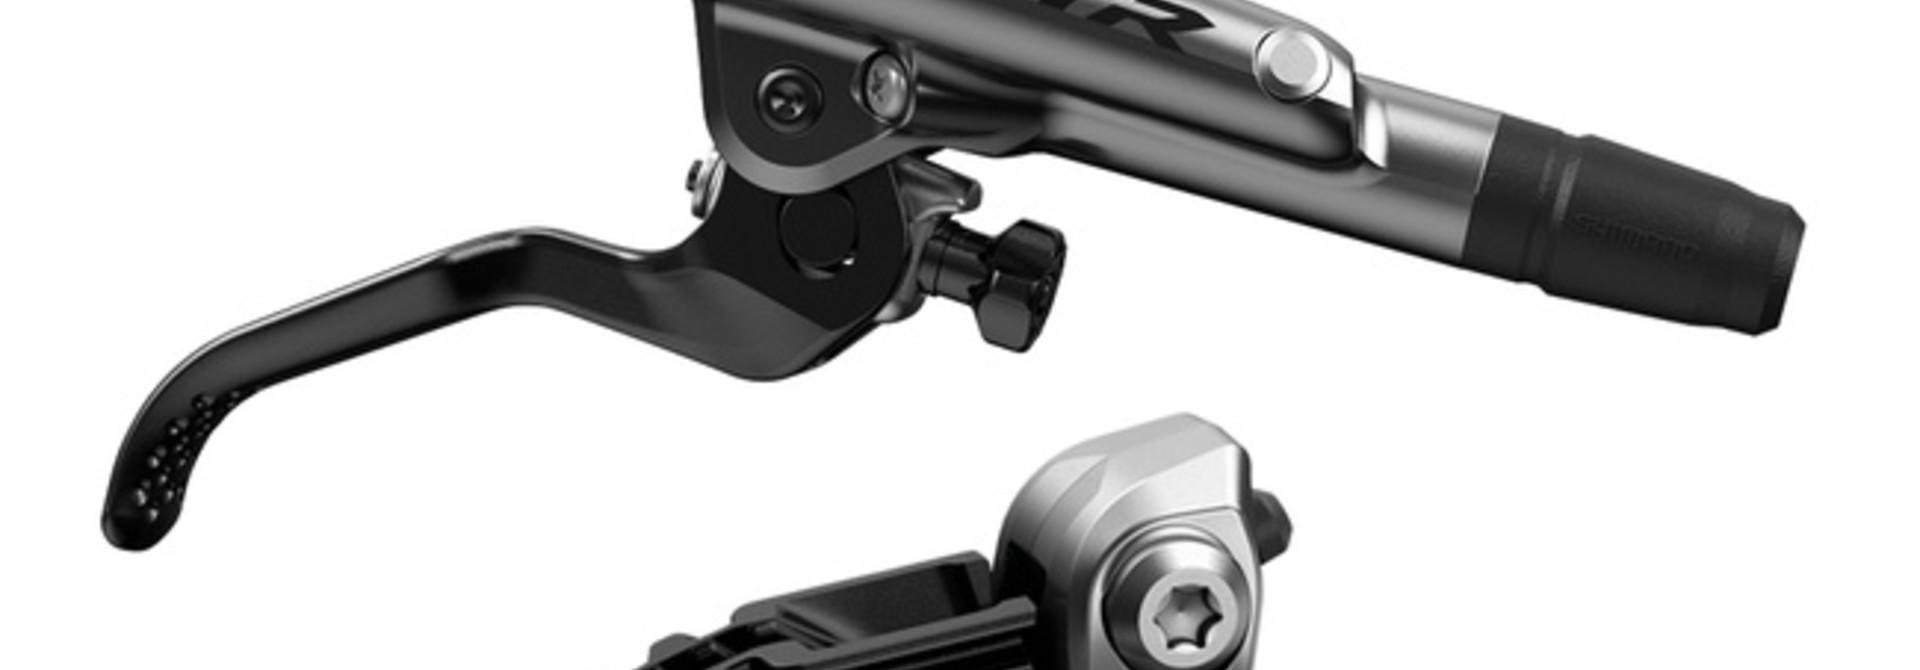 Shimano DISC BRAKE ASSEMBLED SET/J-kit, XTR, BL-M9120(R), B, rear